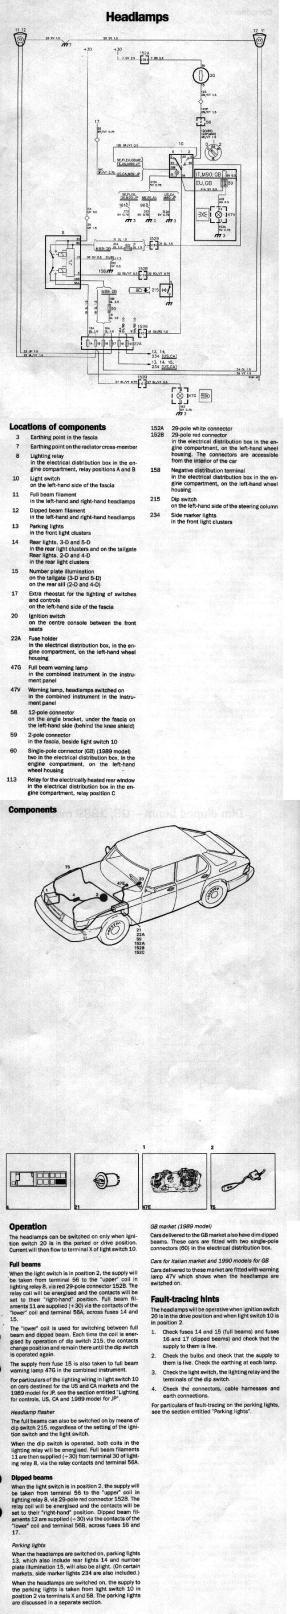 89 Saab 900 Wiring Diagram | Wiring Library